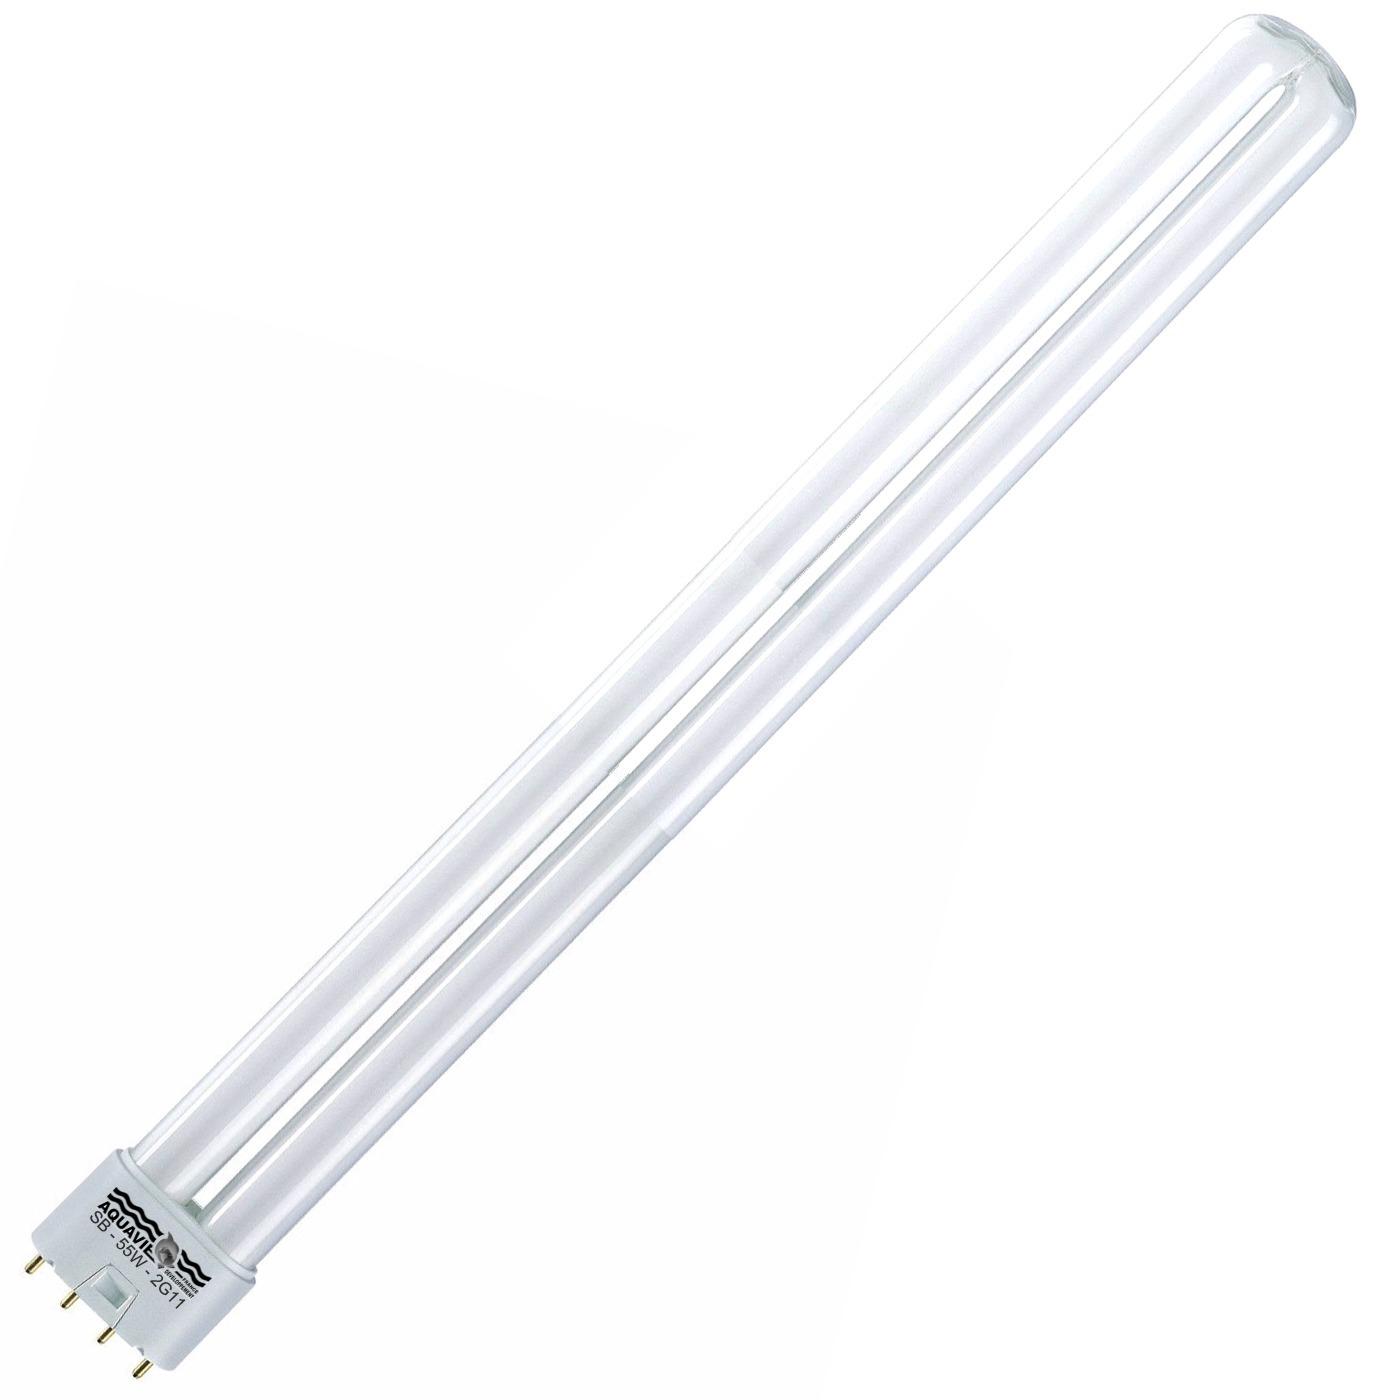 aquavie-lumivie-sb-55w-ampoule-fluocompact-culot-2g11-aquarium-eau-de-mer-douce-akouashop